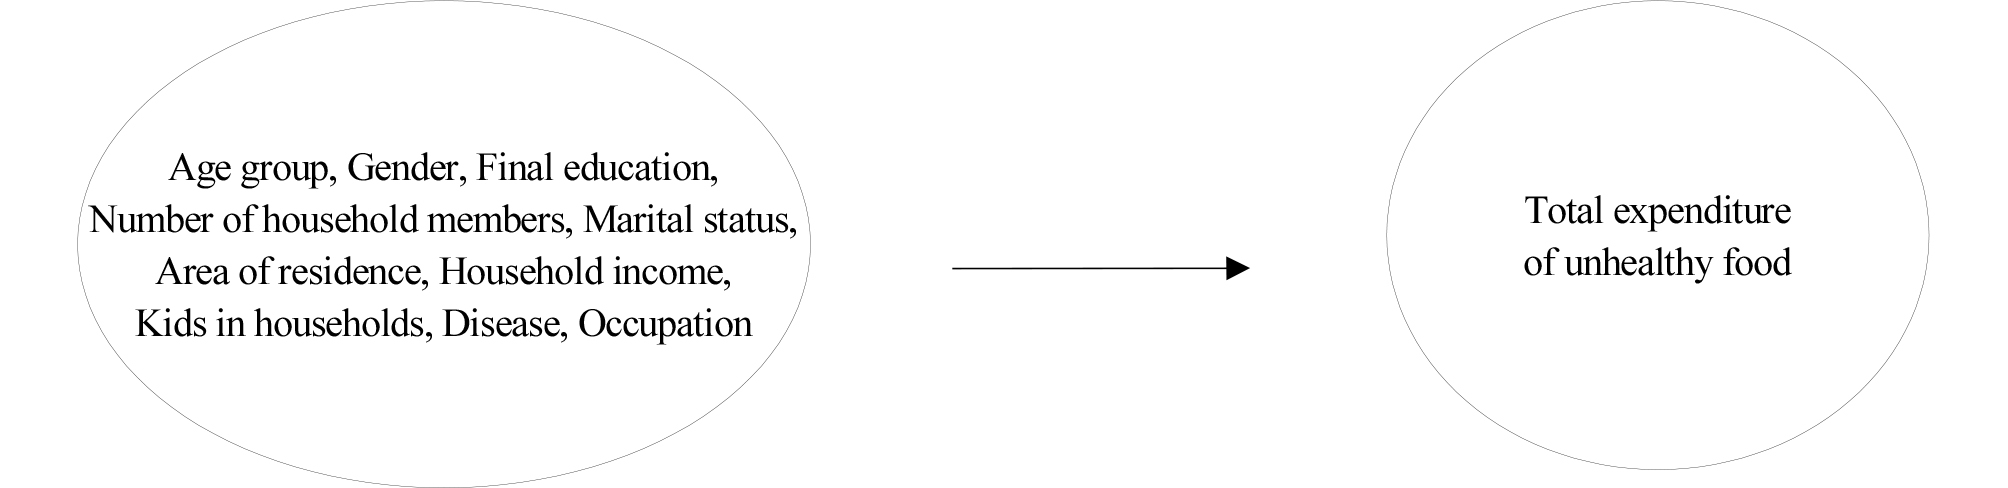 http://static.apub.kr/journalsite/sites/ales/2020-032-03S/N0250320S02/images/ales_32_S_02_F1.jpg